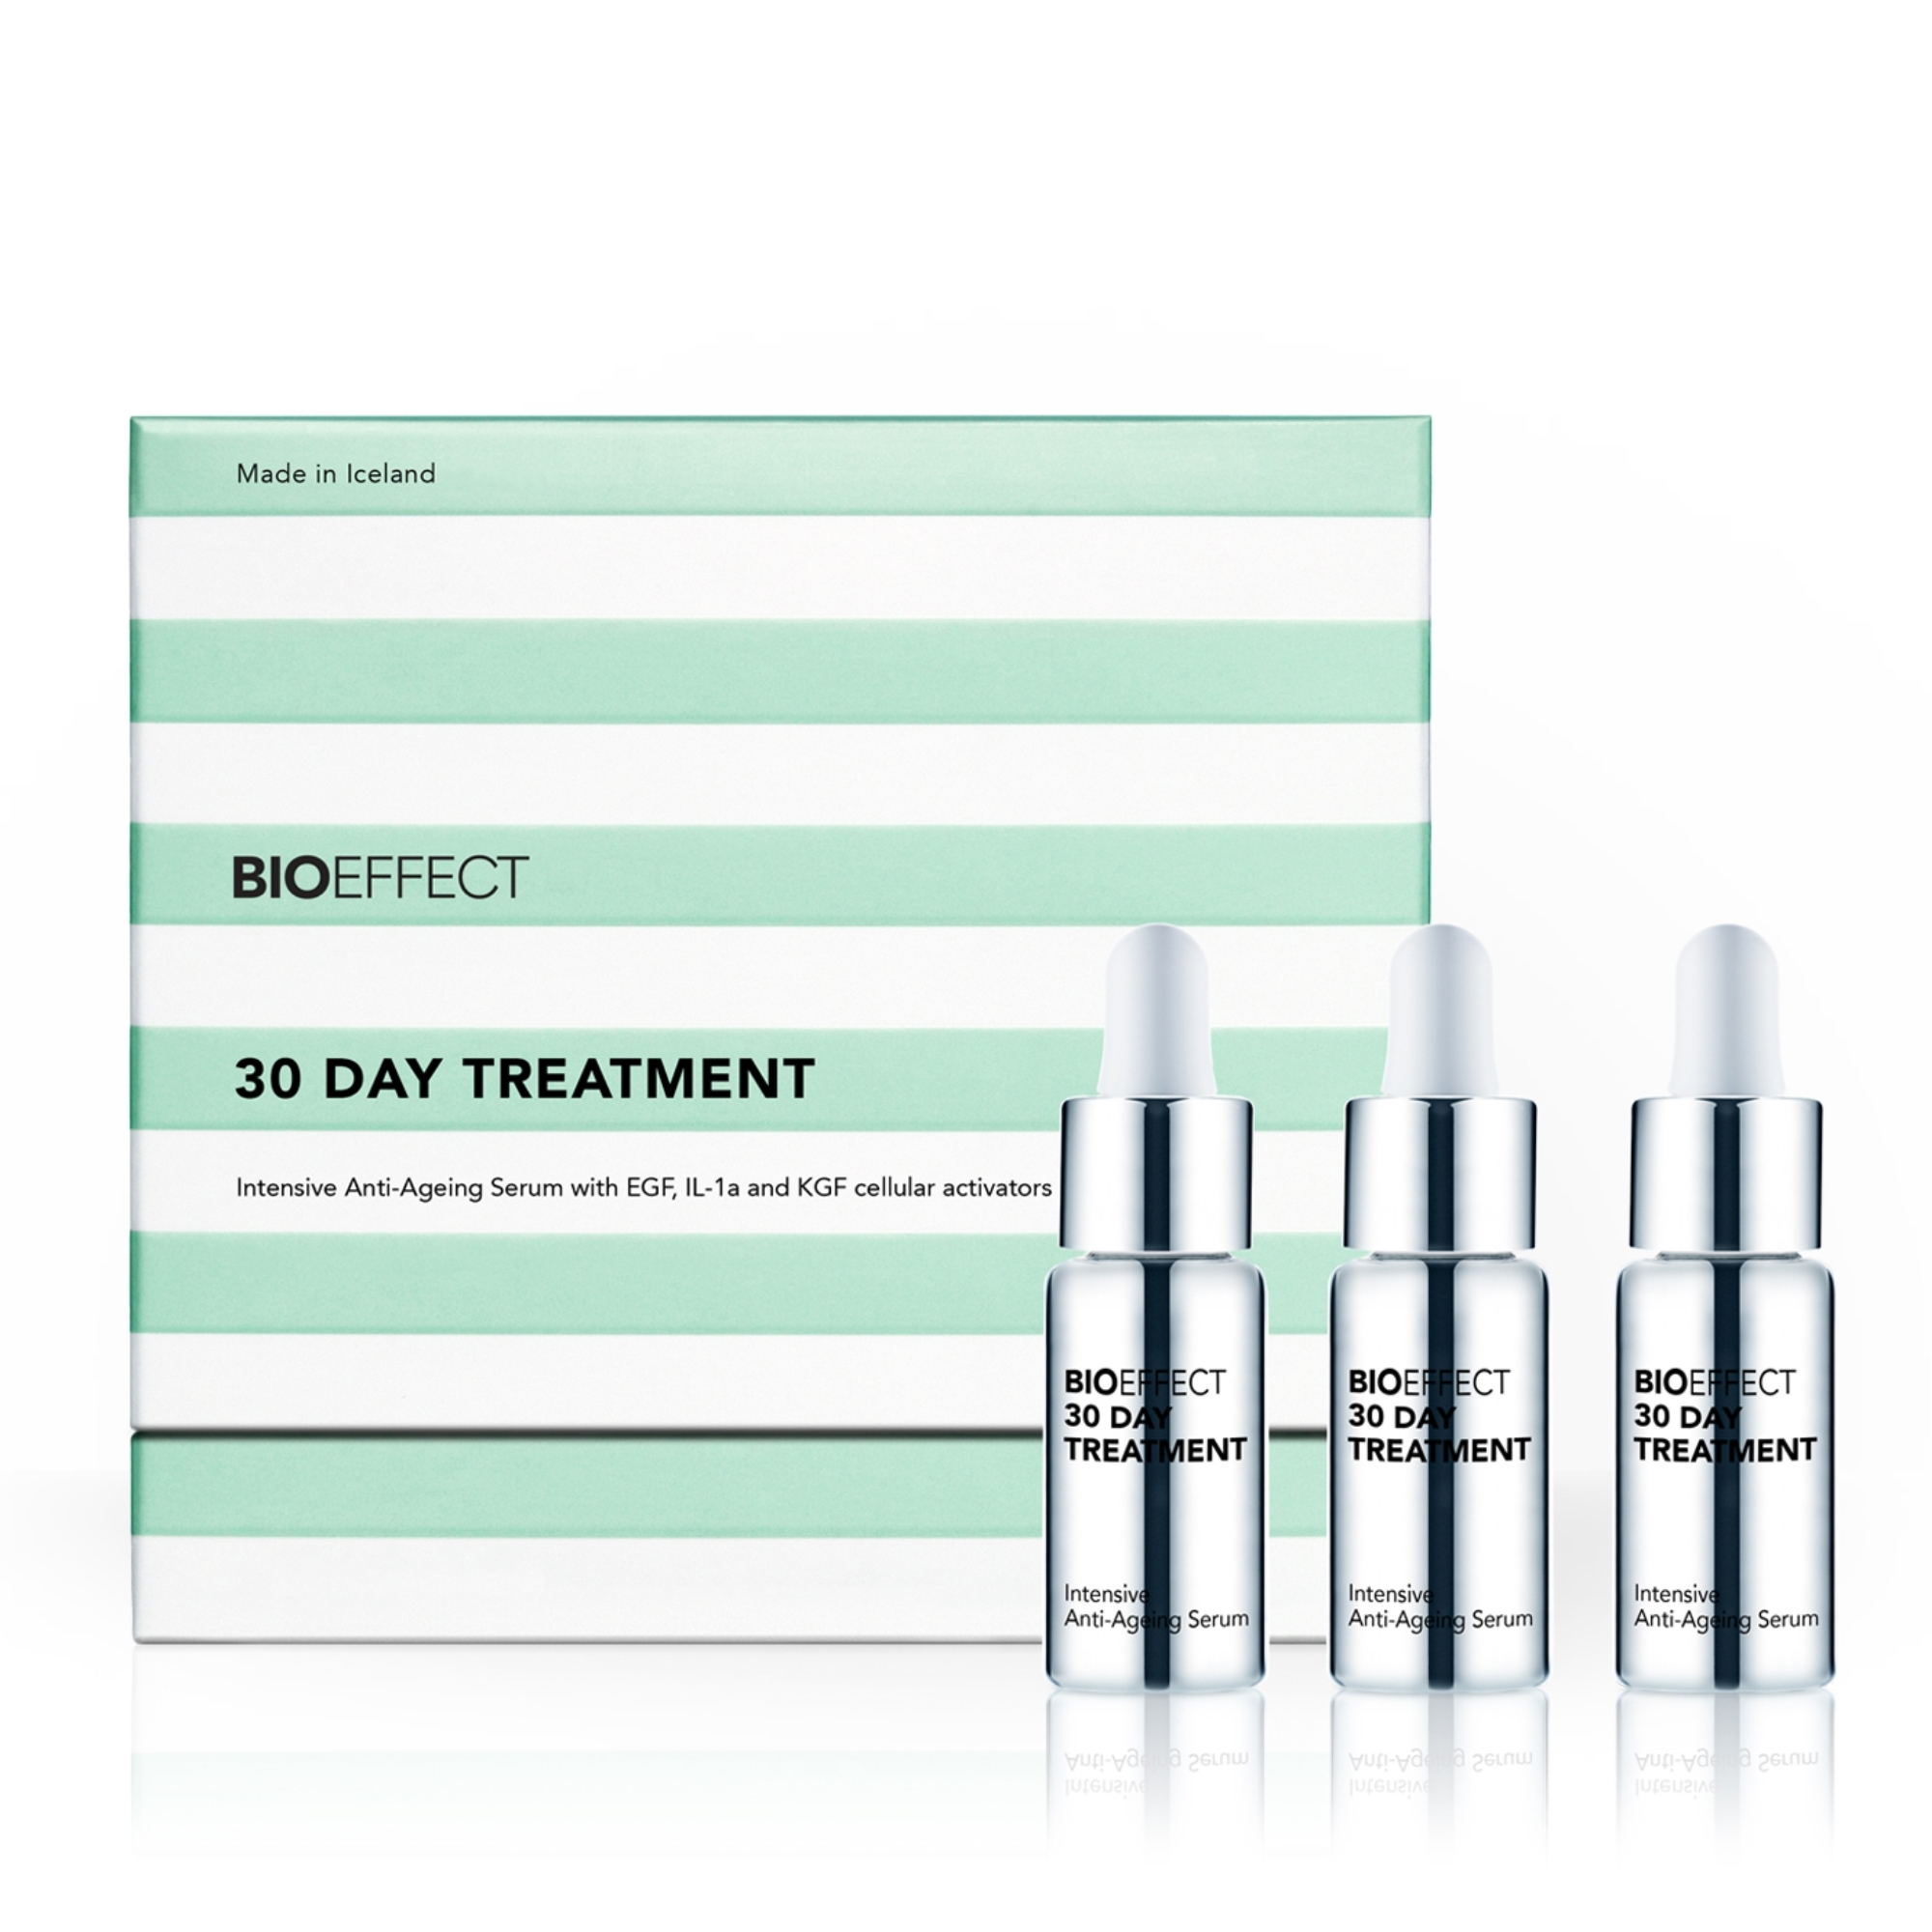 30 Day Treatment 15ml